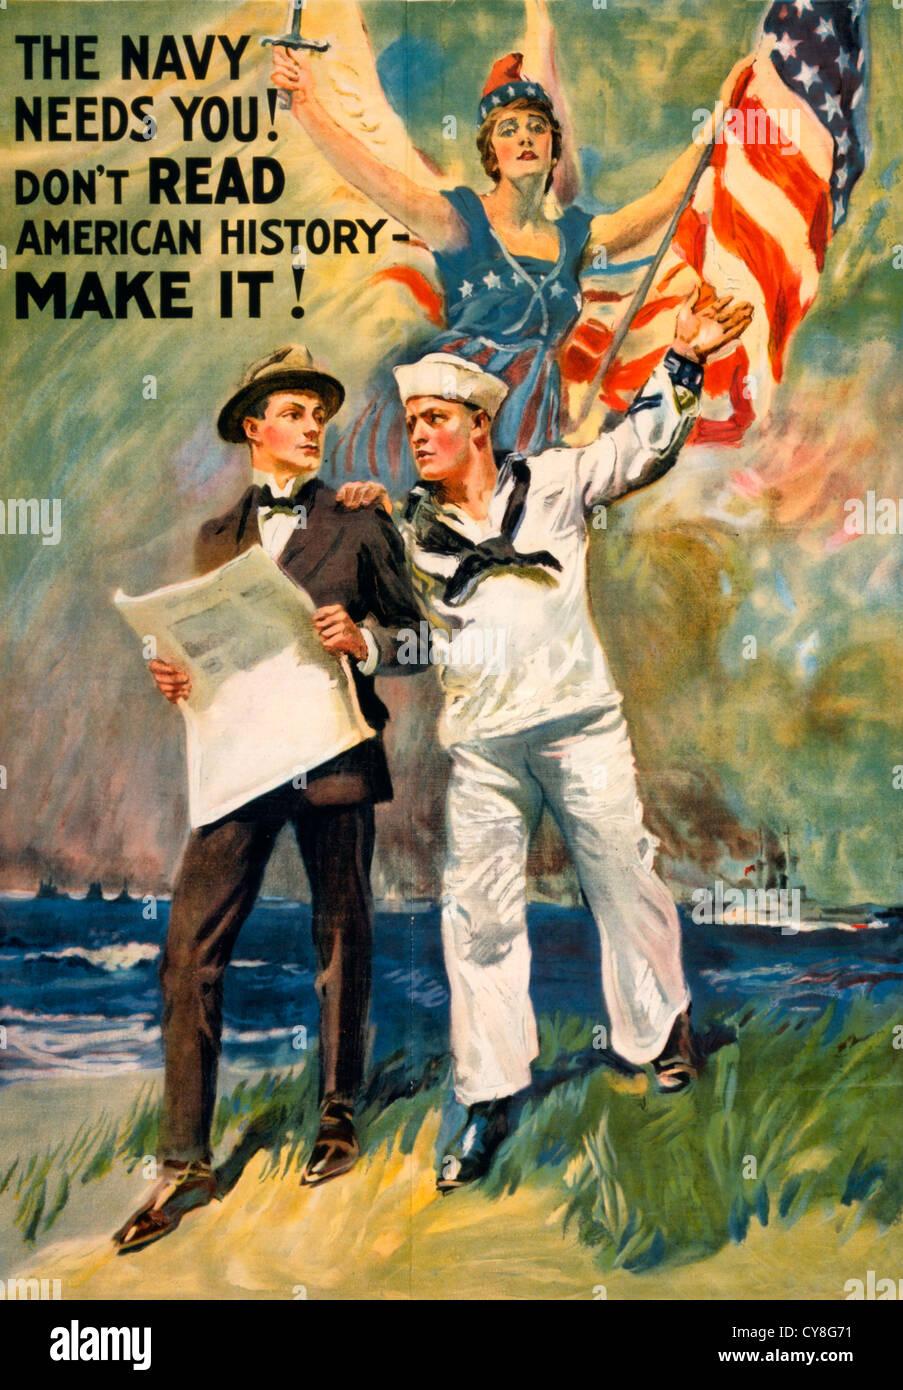 La Marina te necesita! No lea la historia americana - make it! WWI Póster que muestra un marinero teniendo Imagen De Stock